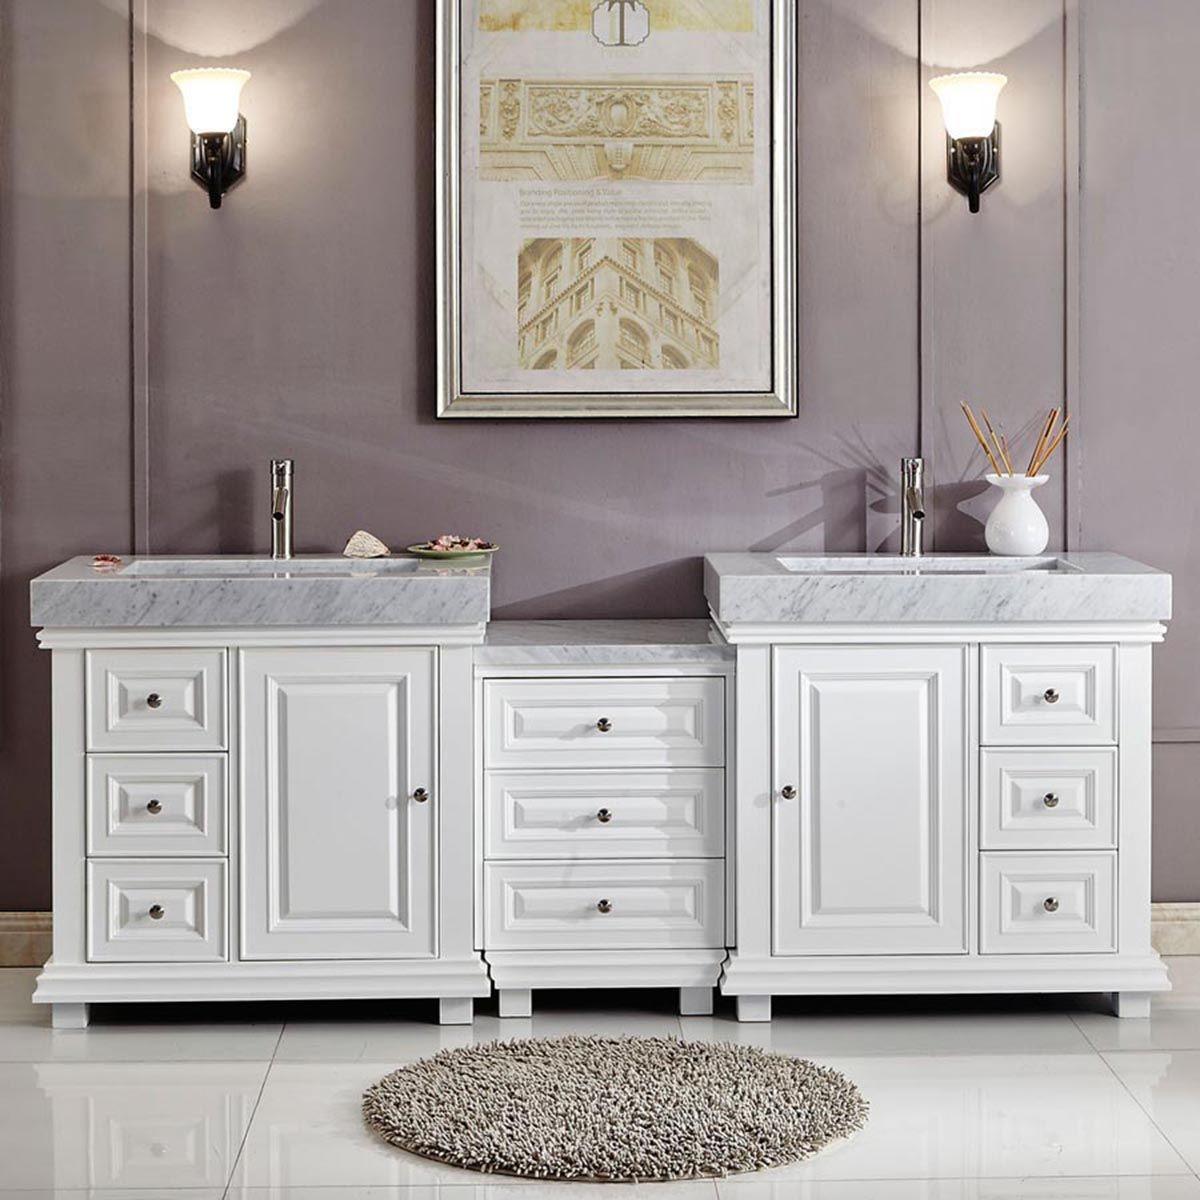 "Double Bathroom Sinks Fresh 90"" Modern Double Bathroom Vanity White"